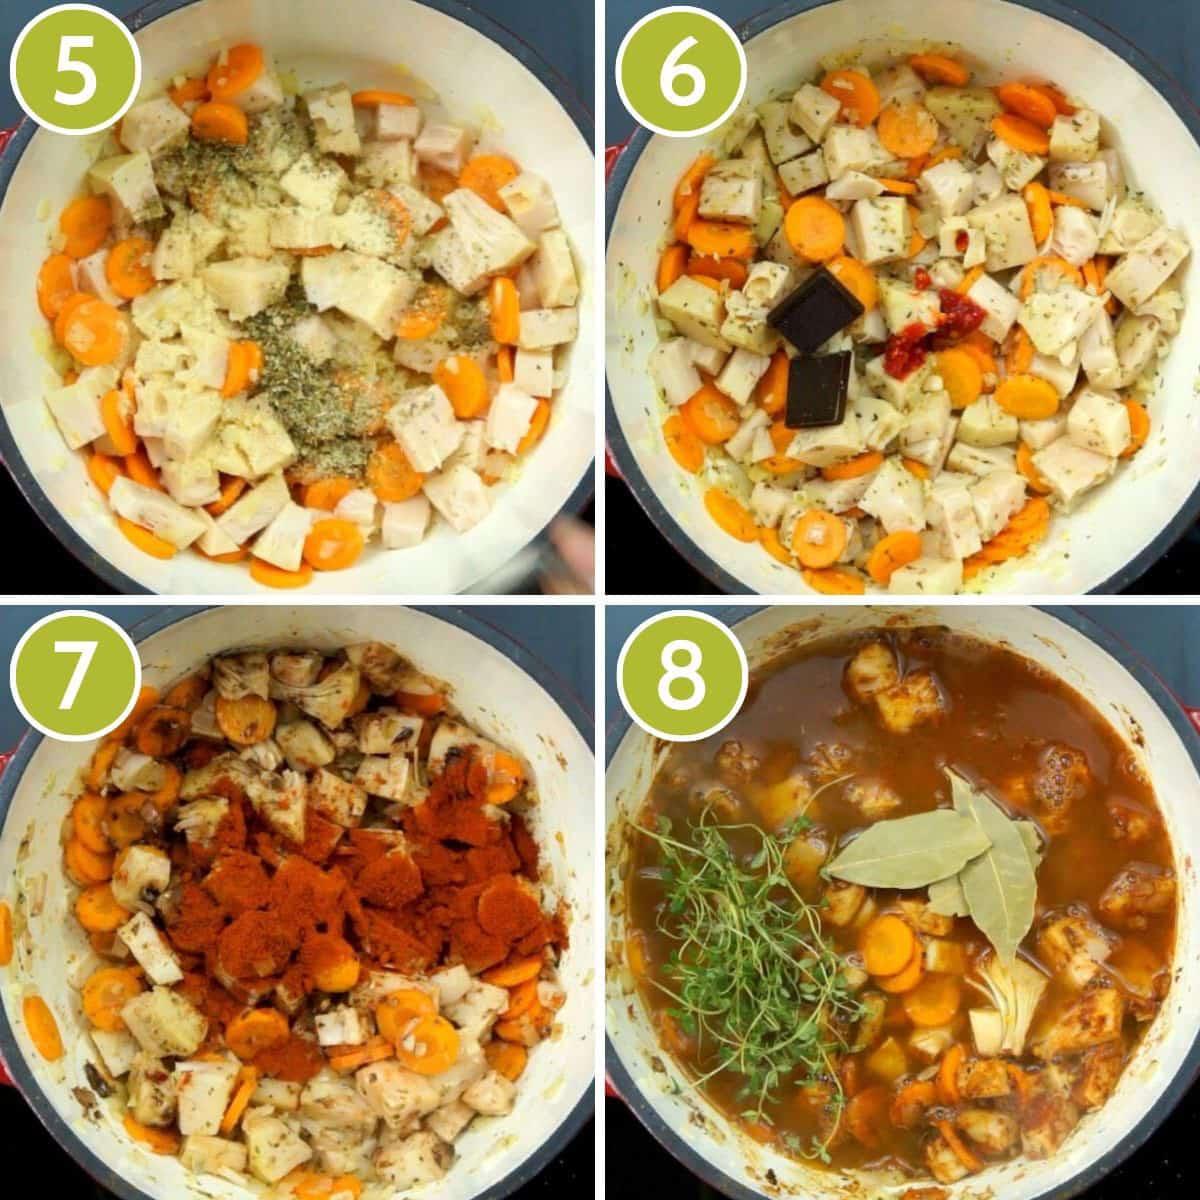 4 step photos to make vegan stew - adding jackfruit, seasoning, sriracha, chocolate, smoked paprika, thyme and bay leaves